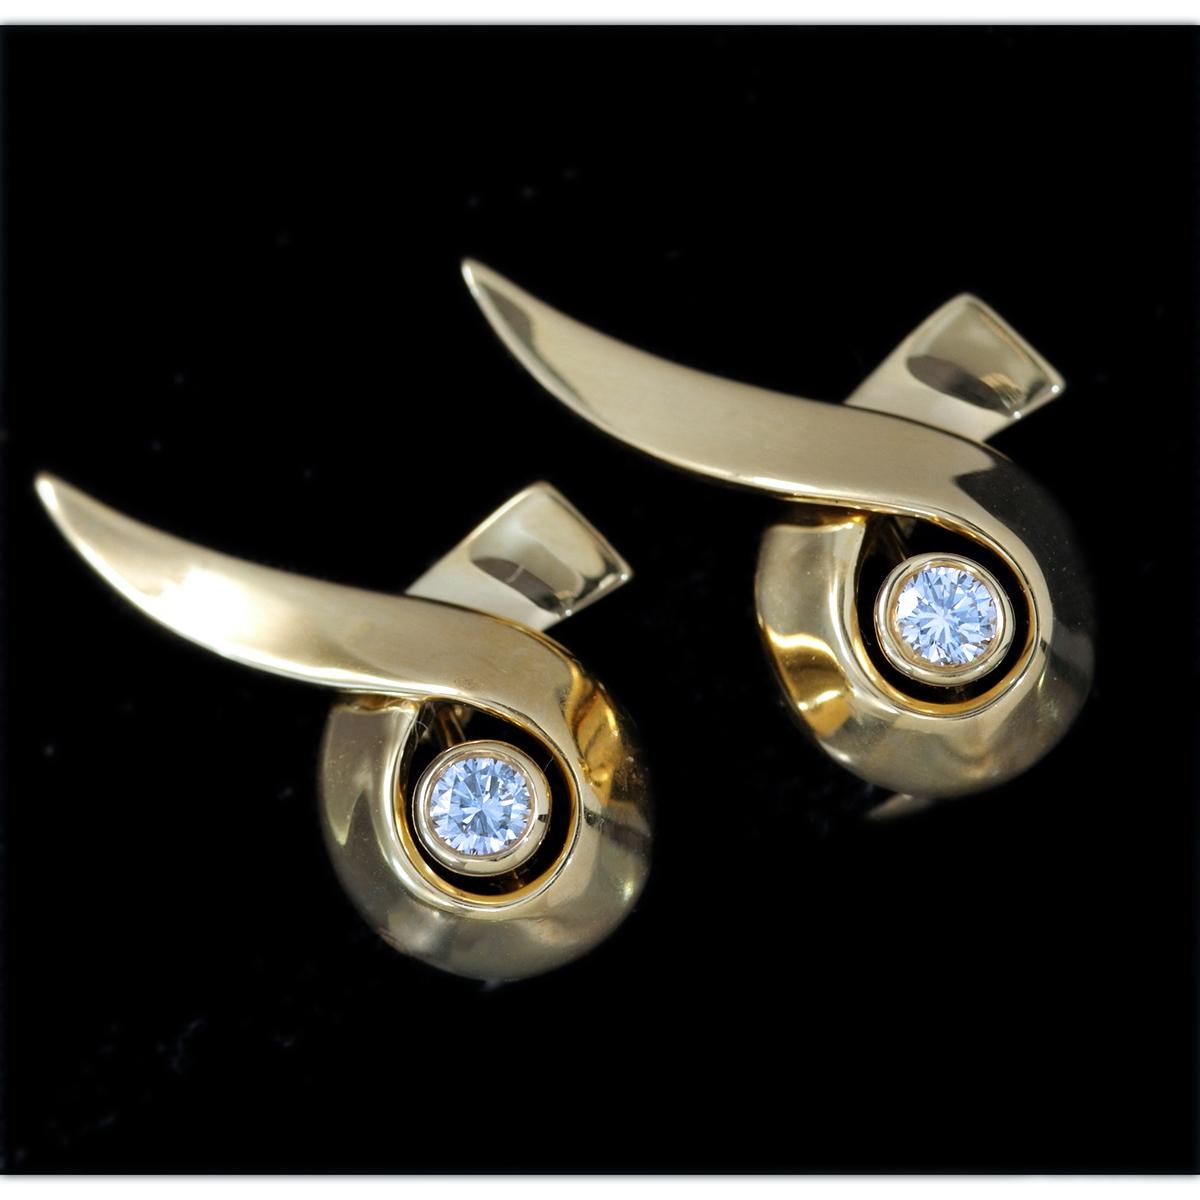 E9962【Tiffany&Co. 1837】ティファニー パロマピカソ 天然絶品ダイヤモンド2pcs 最高級18金無垢イヤリング 重量7.9g 幅13.6×23.3mm_画像1